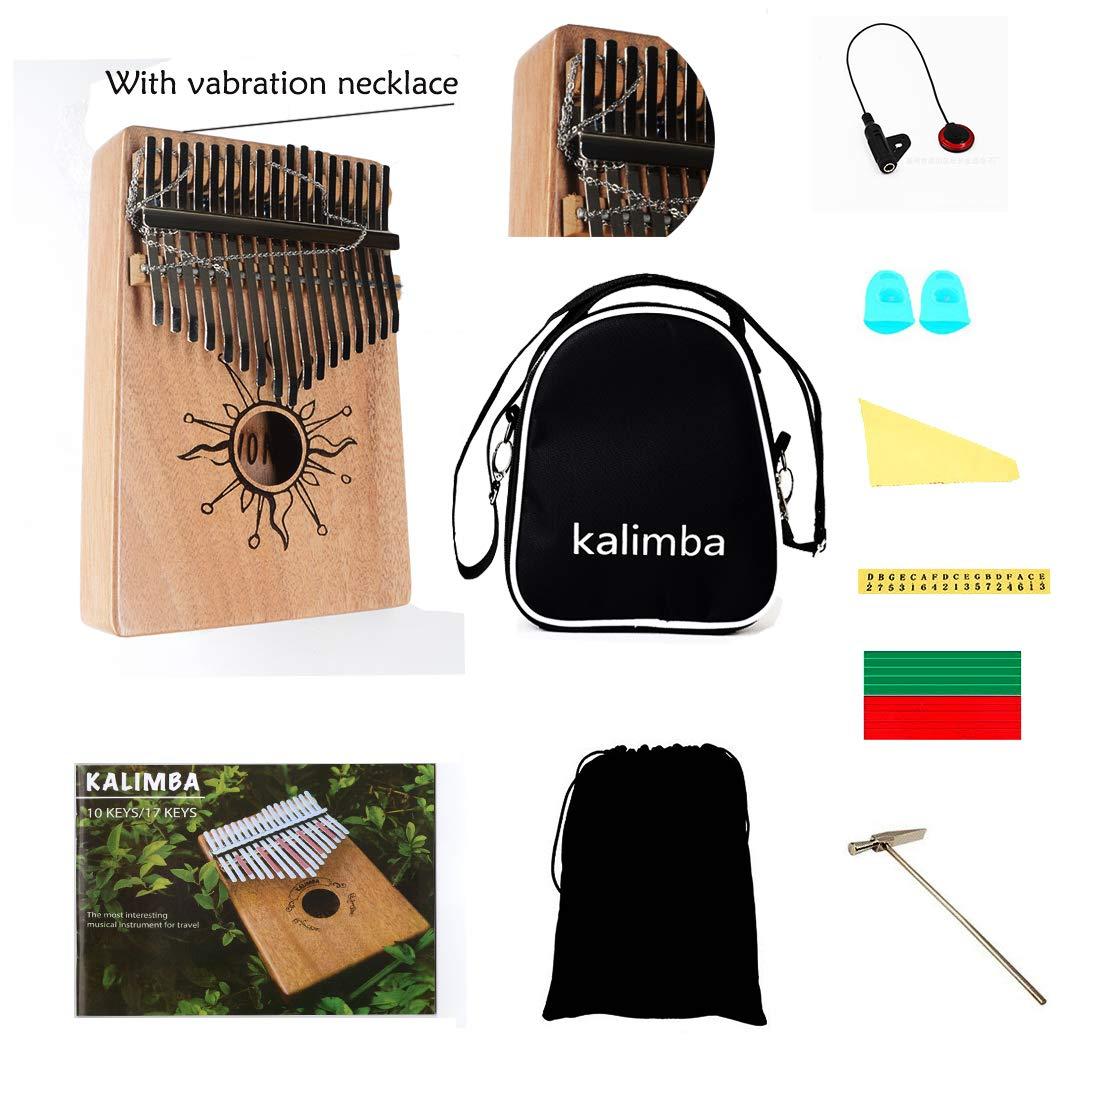 AOVOA Thumb Piano, 17 key Kalimba, Finger Piano Mbira, Mahogany Body Kalimba with Tuning Hammer, Pickup, Finger Guards, Carry Bag and Key stickers, Ideal Gift for Music Fans by AOVOA (Image #7)